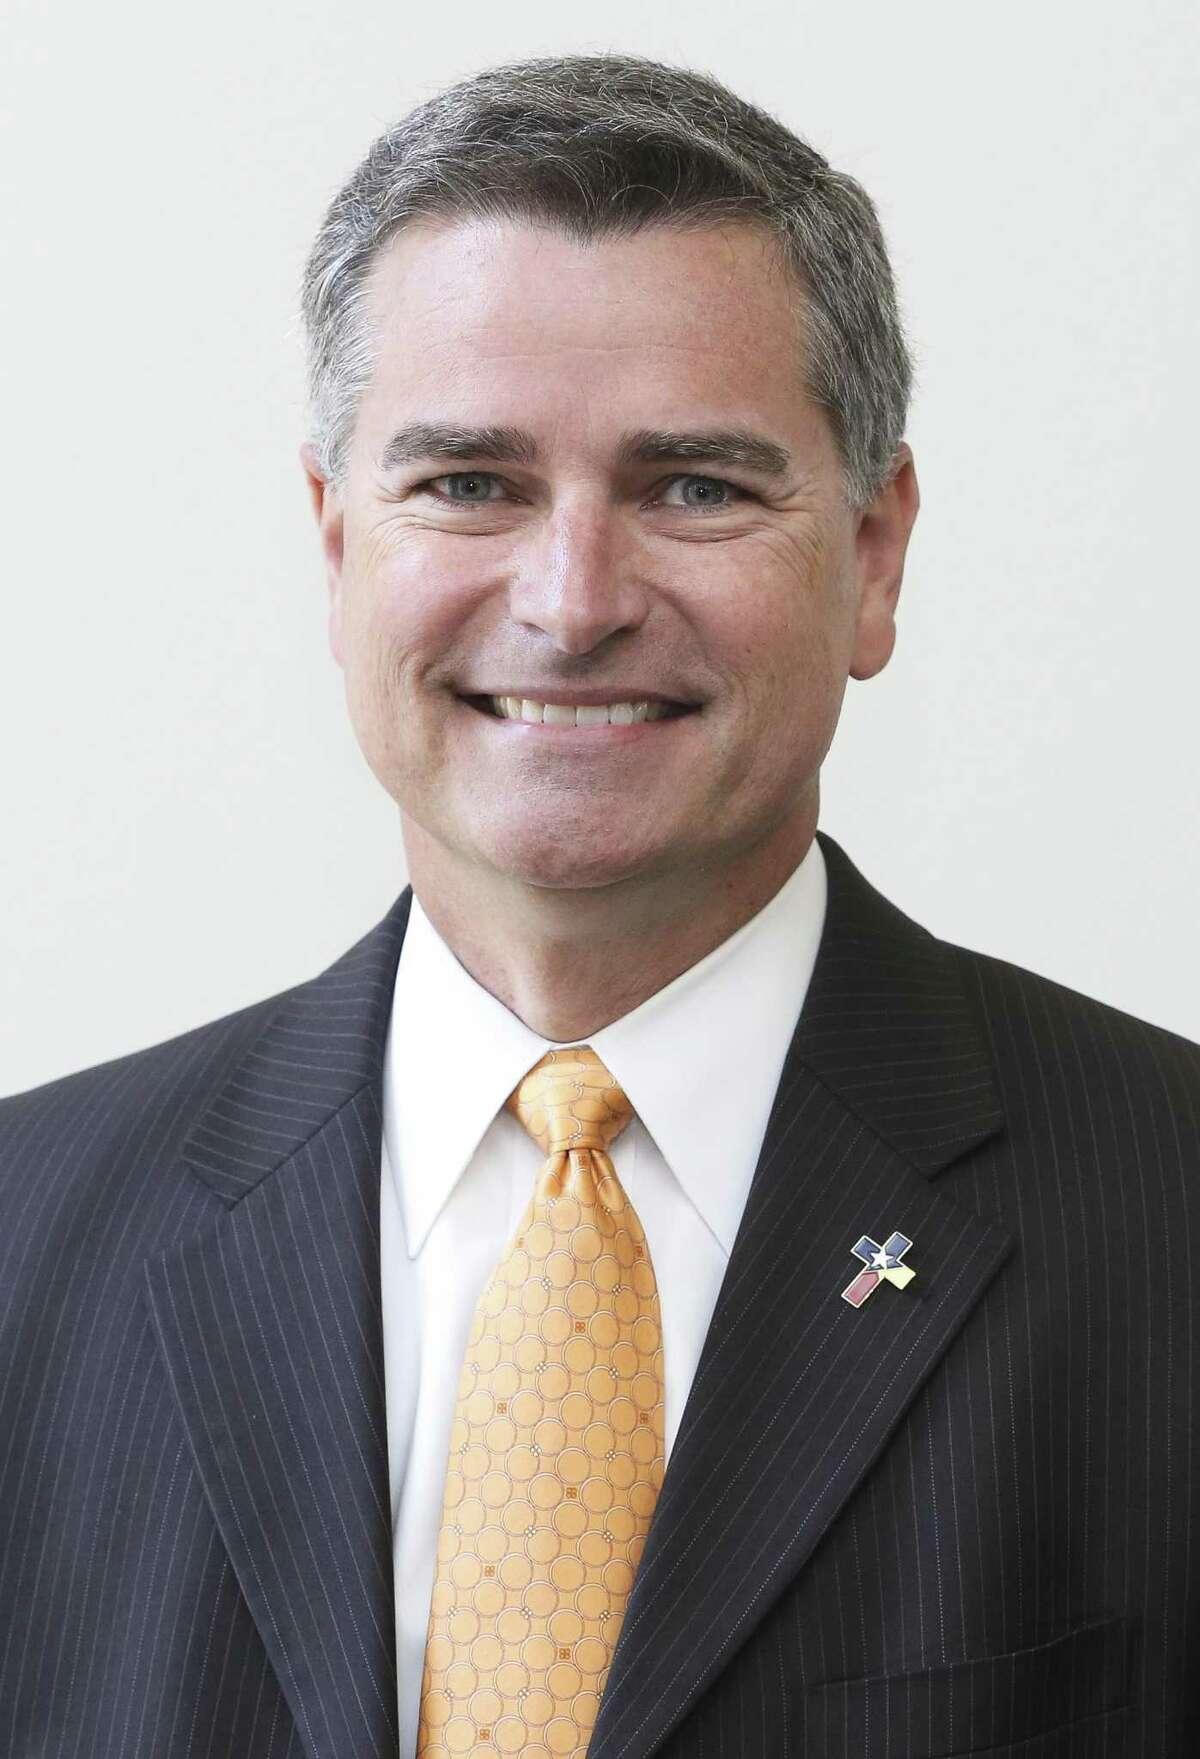 Josh Flynn, president of the Harris County Department of Education's board, on Thursday, Oct. 4, 2018, in Houston.